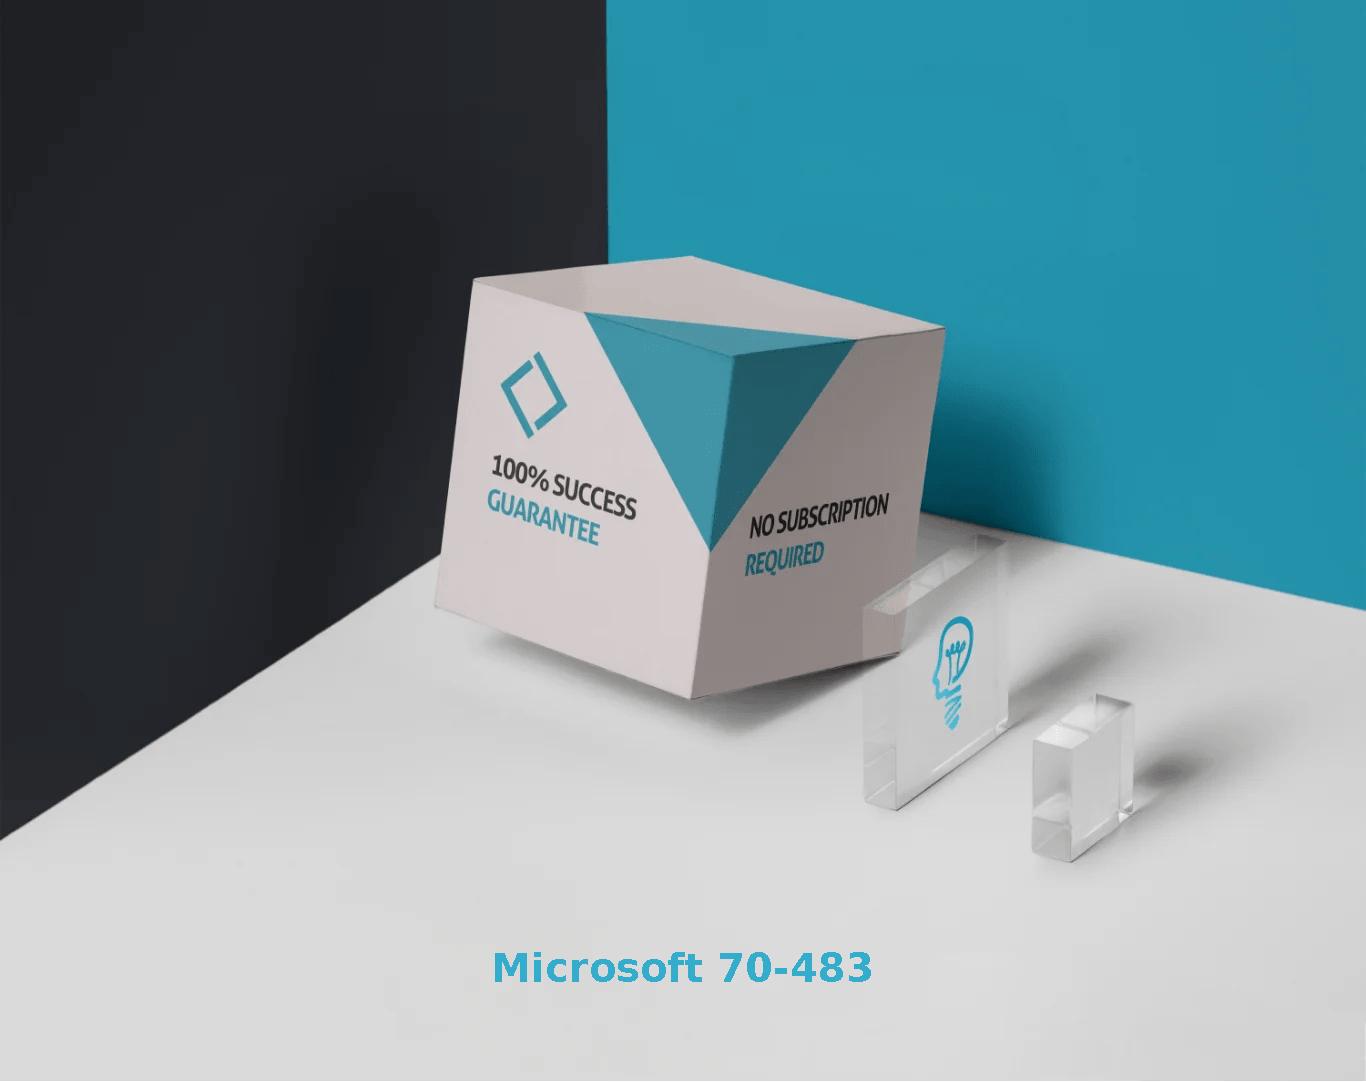 Microsoft 70-483 Exams